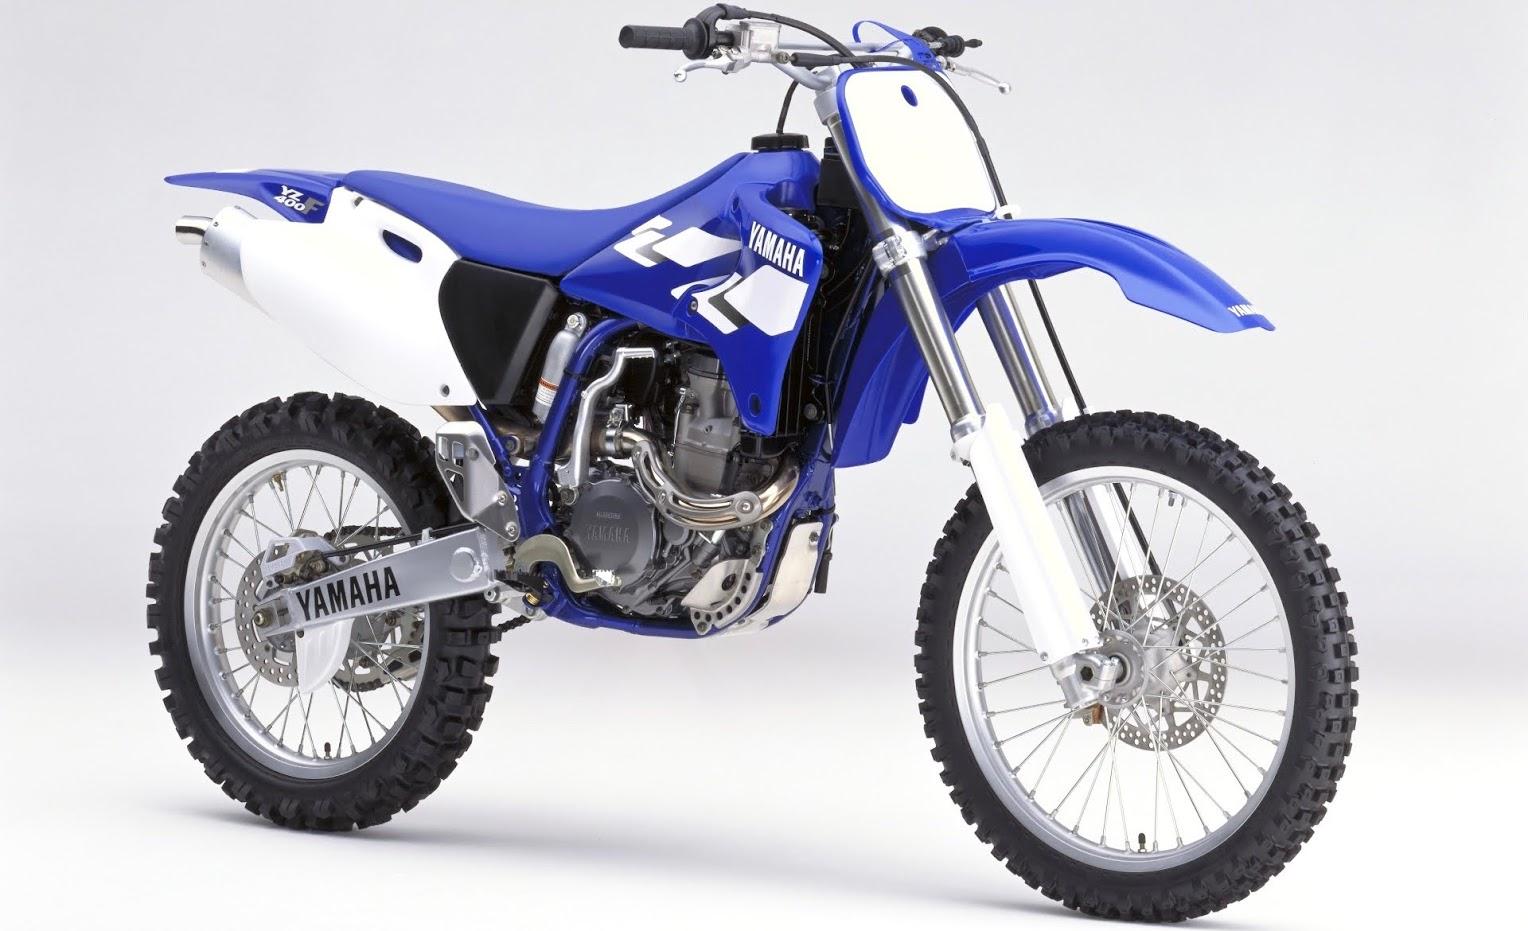 Yamaha YZ 400 F-manual-taller-despiece-mecanica